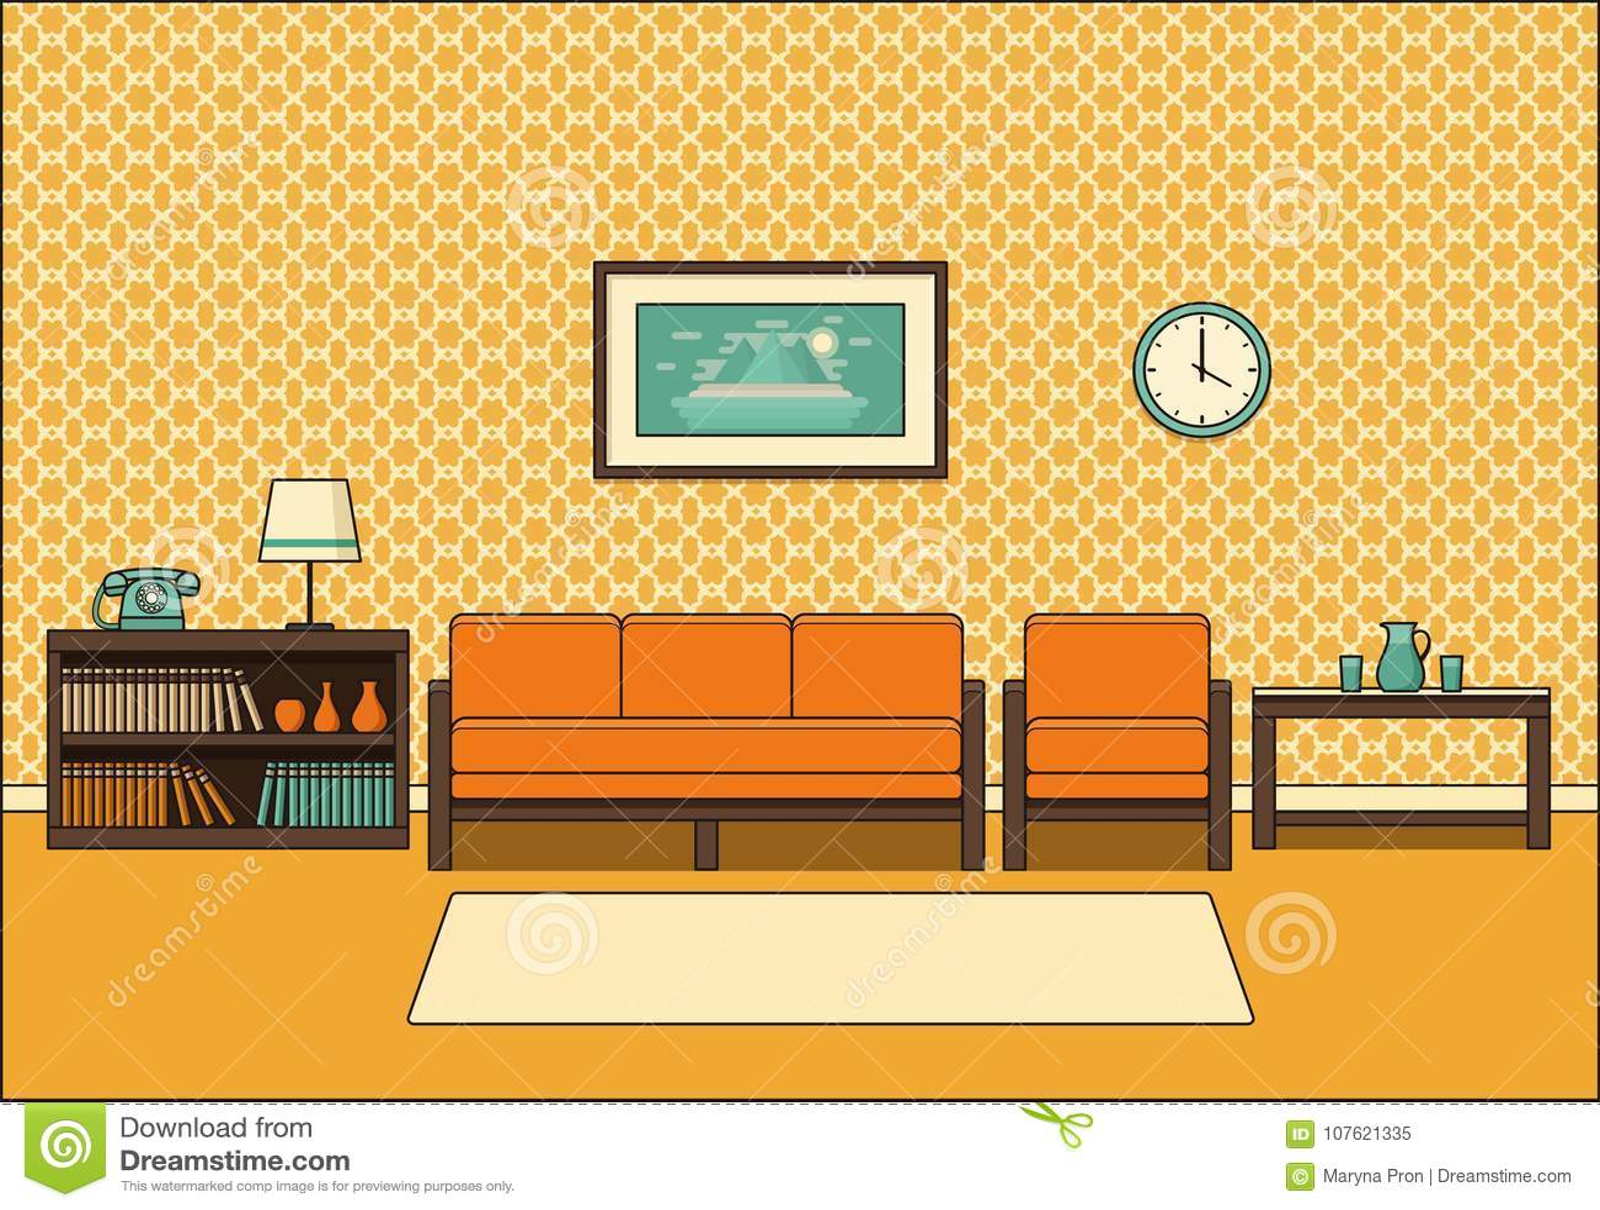 Retro Room Interior In Line Art Flat Design Vector Illustration